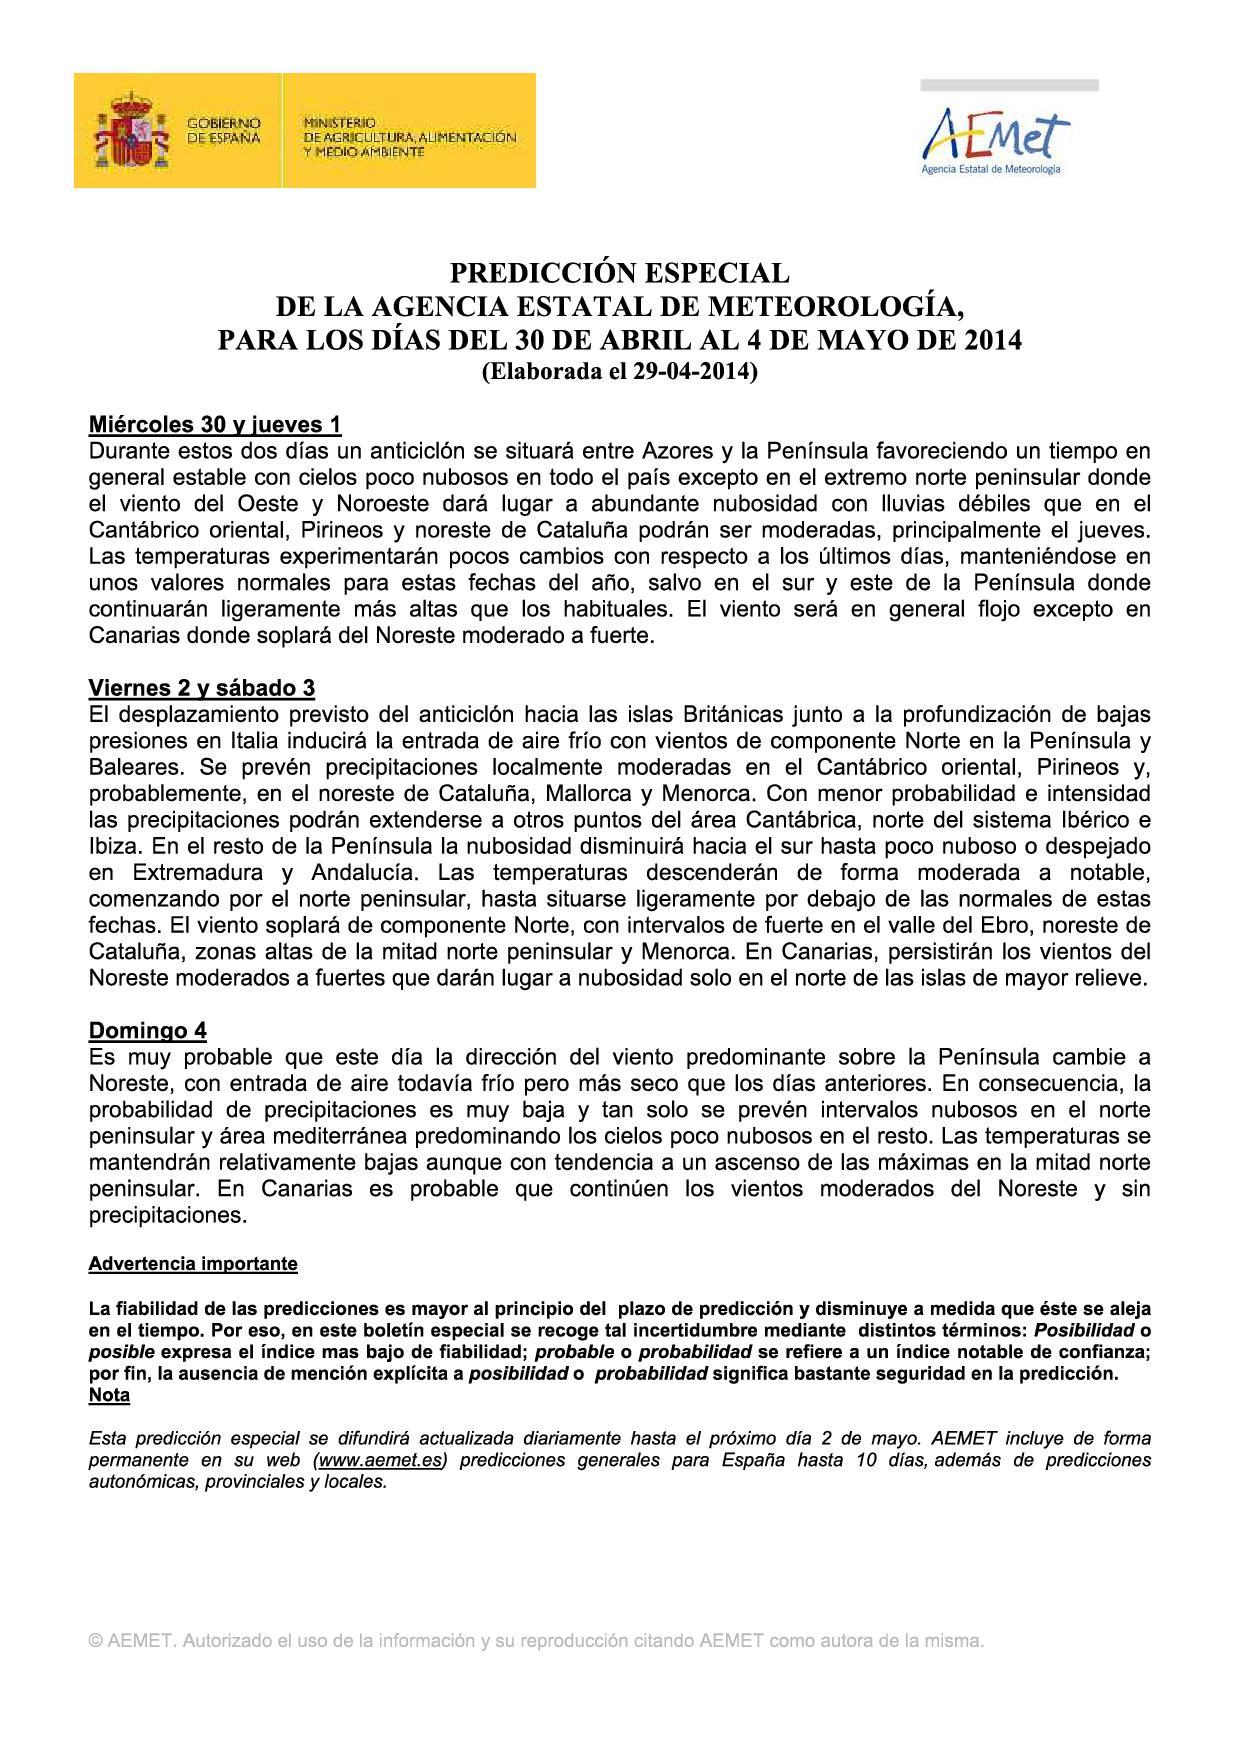 www.aemet.es_documentos_d_enportada_p51tesp1